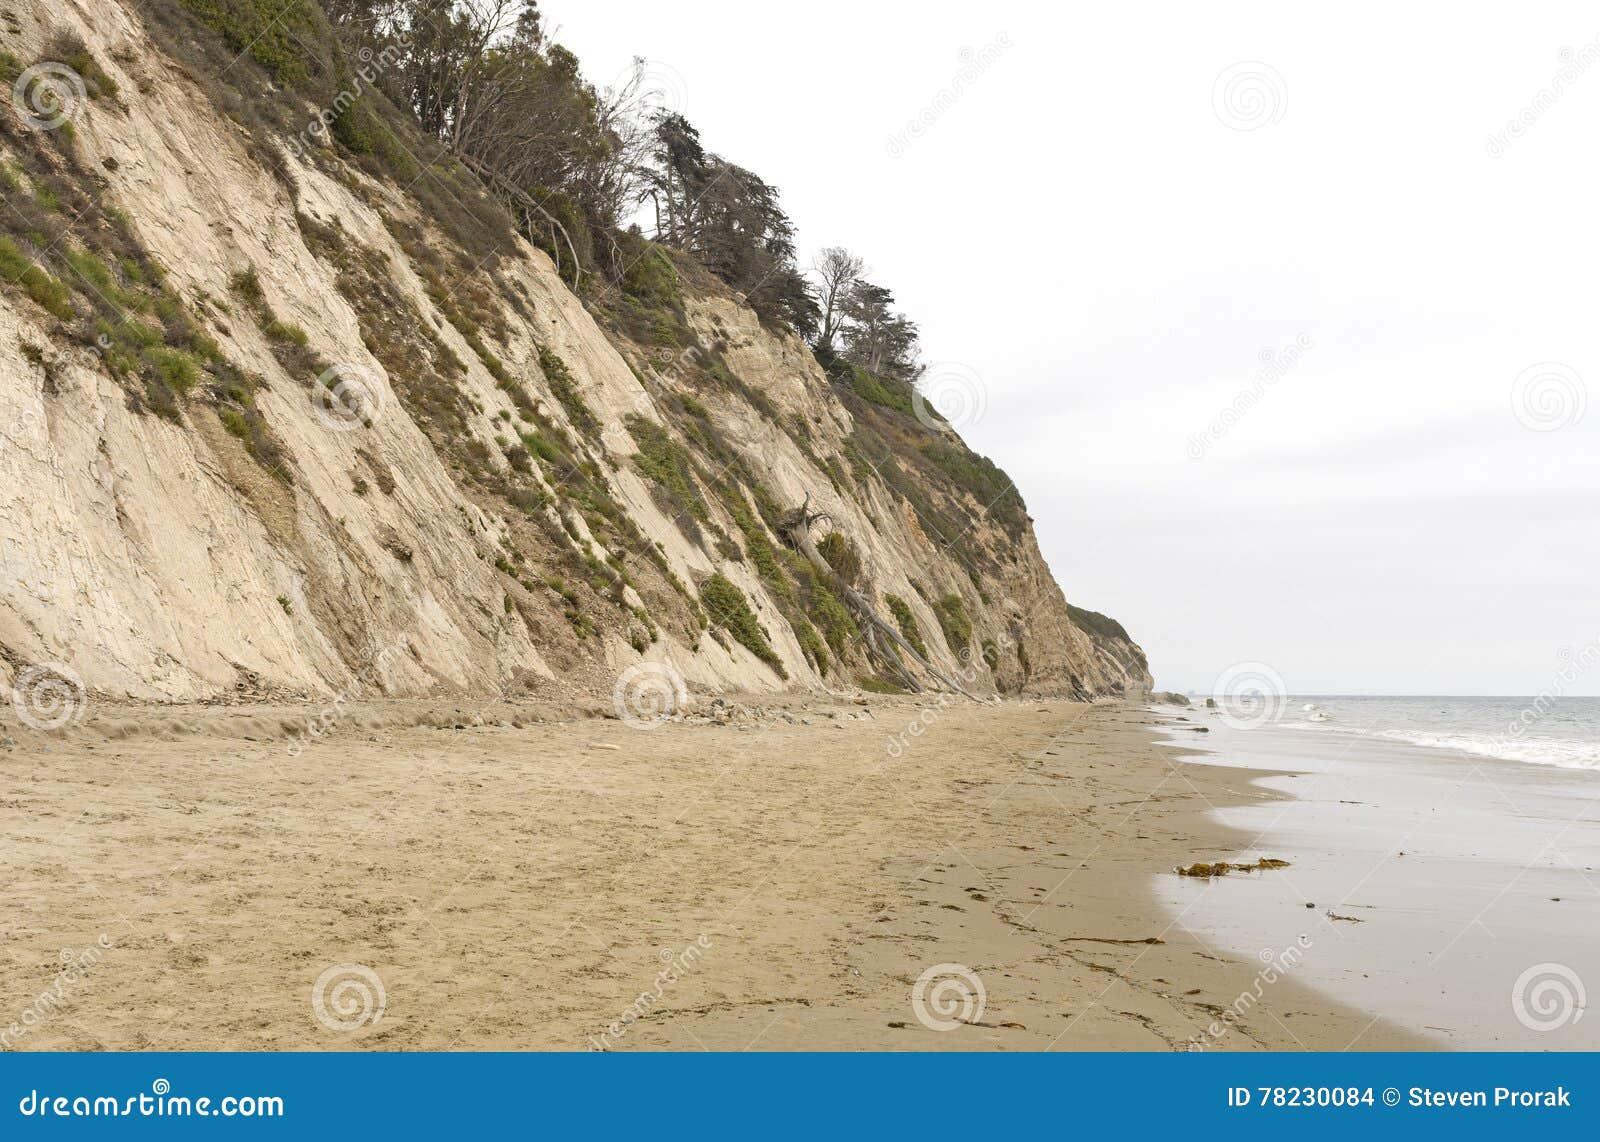 Stil Strand op een Bewolkte Dag